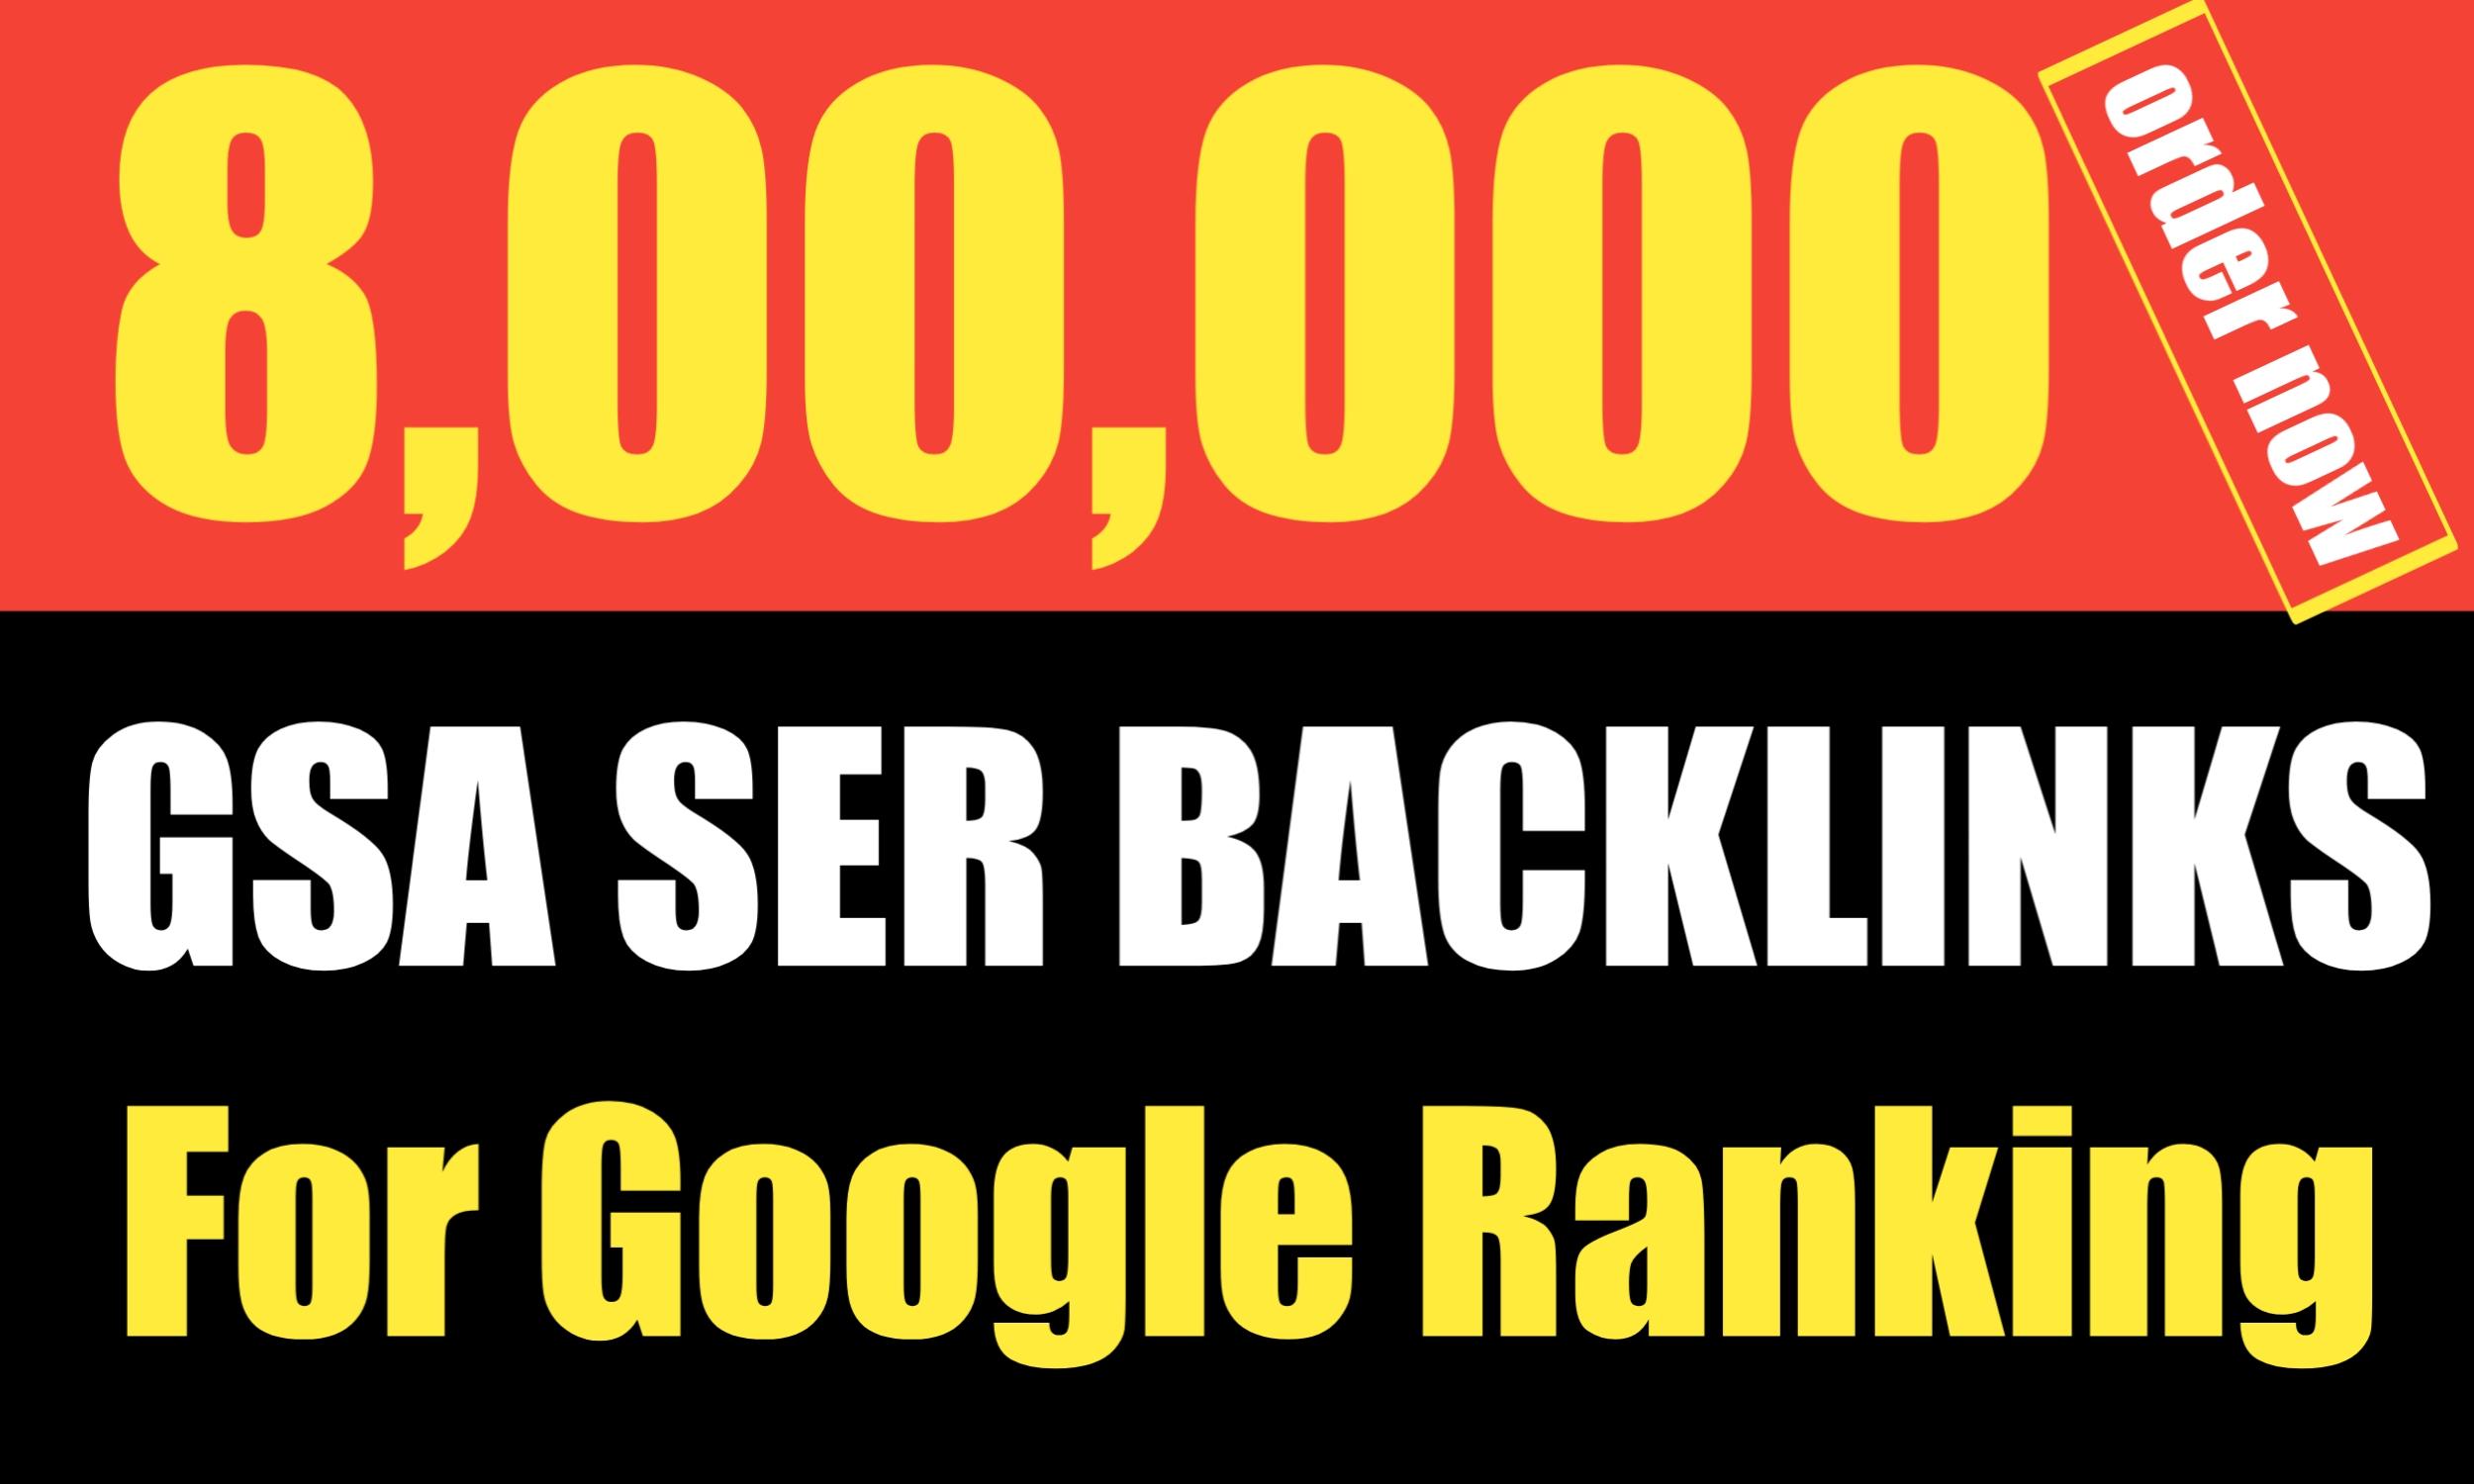 Create 800k High Quality GSA SER Backlinks and Rank your website on Google